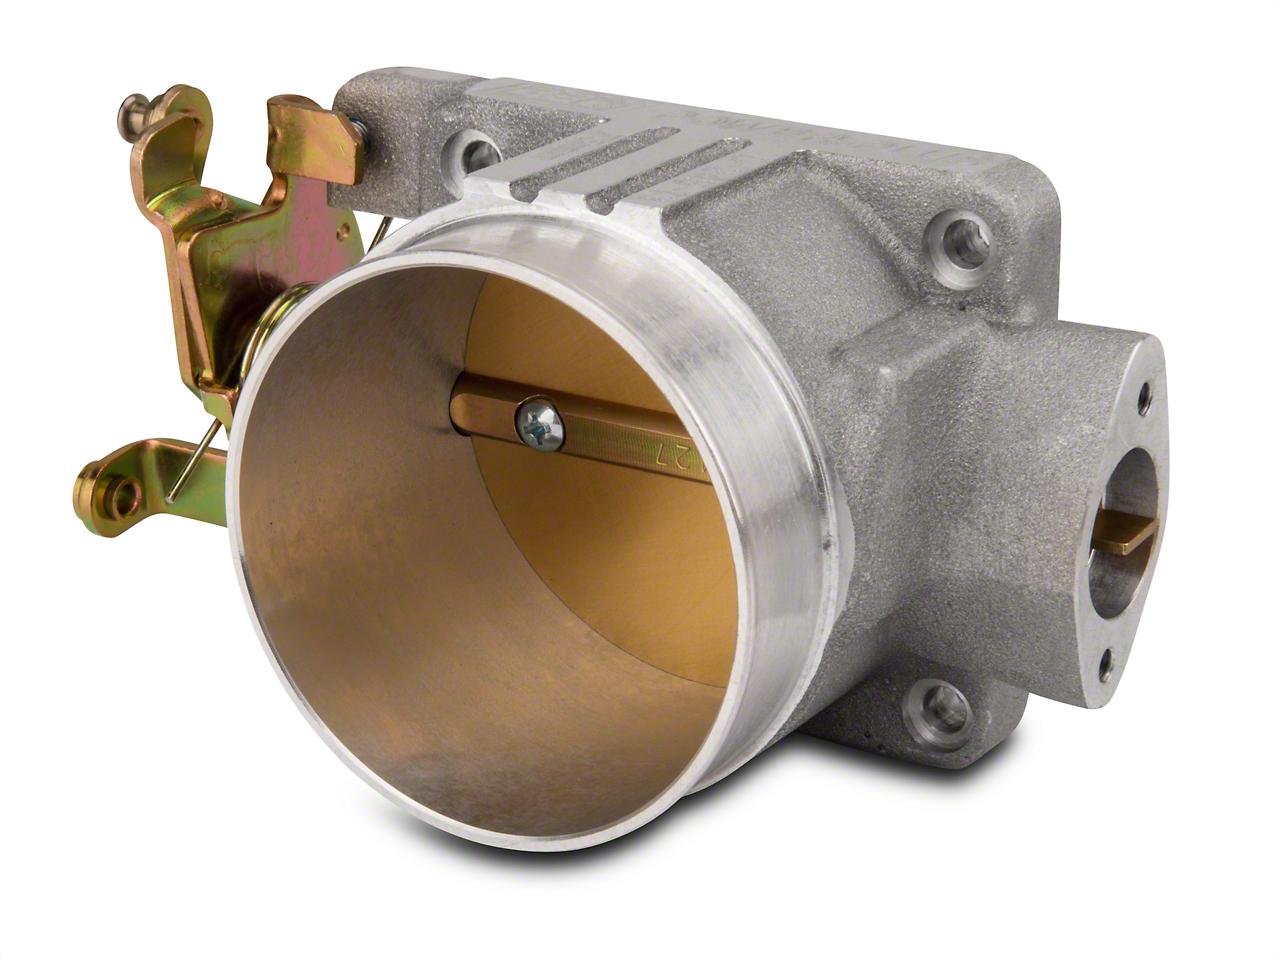 BBK 75mm Throttle Body (97-03 4.6L, 5.4L)